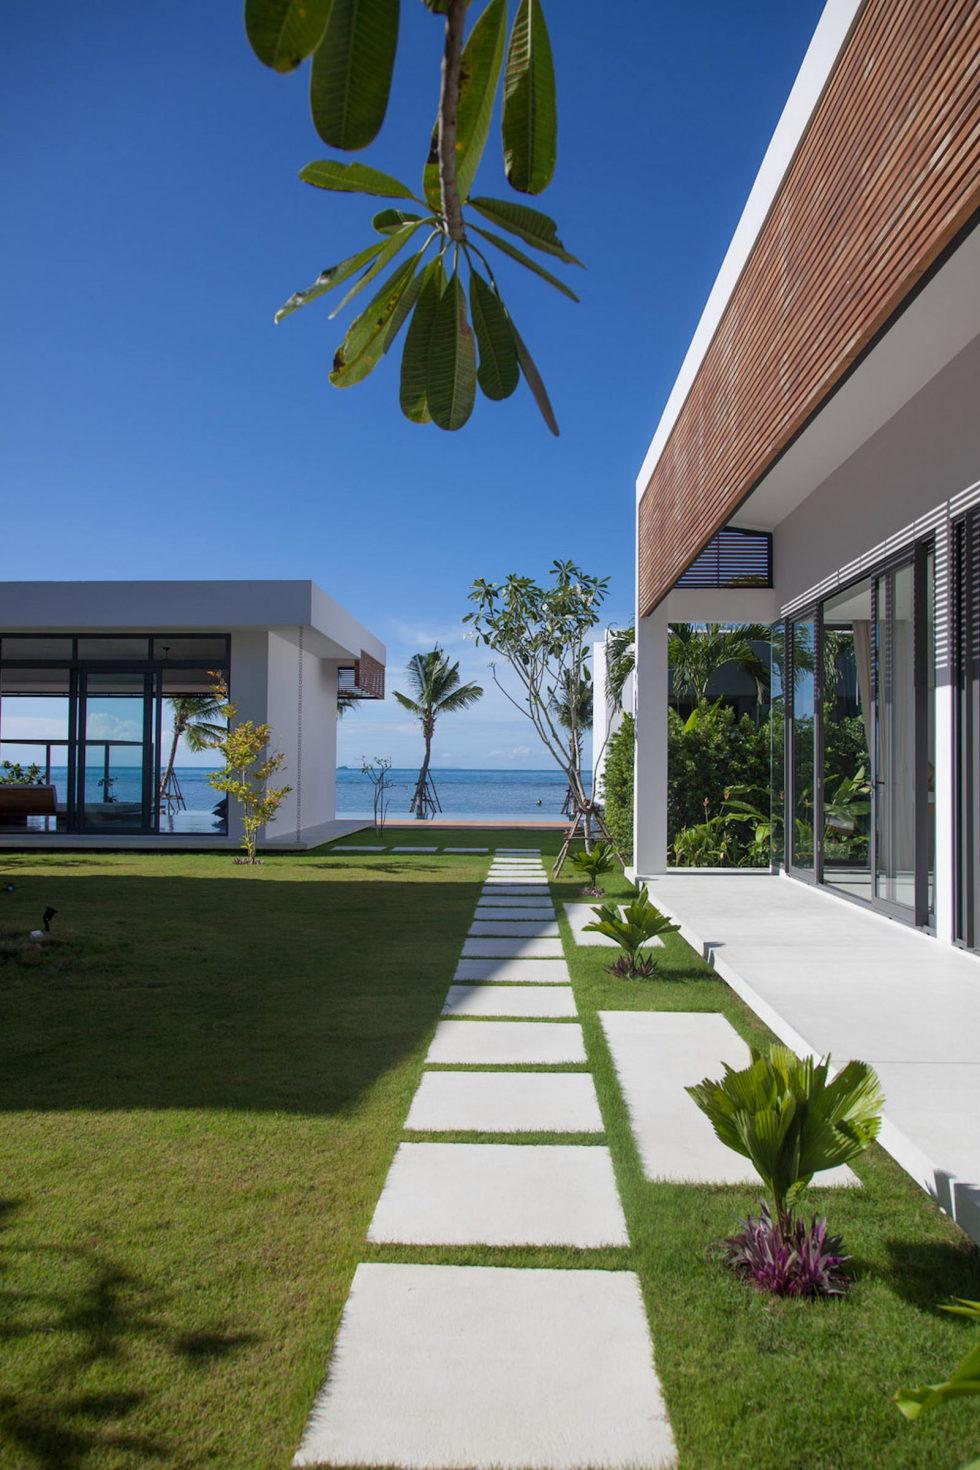 Villa Malouna The Thai Residence By Sicart and Smith Architects Studio 34